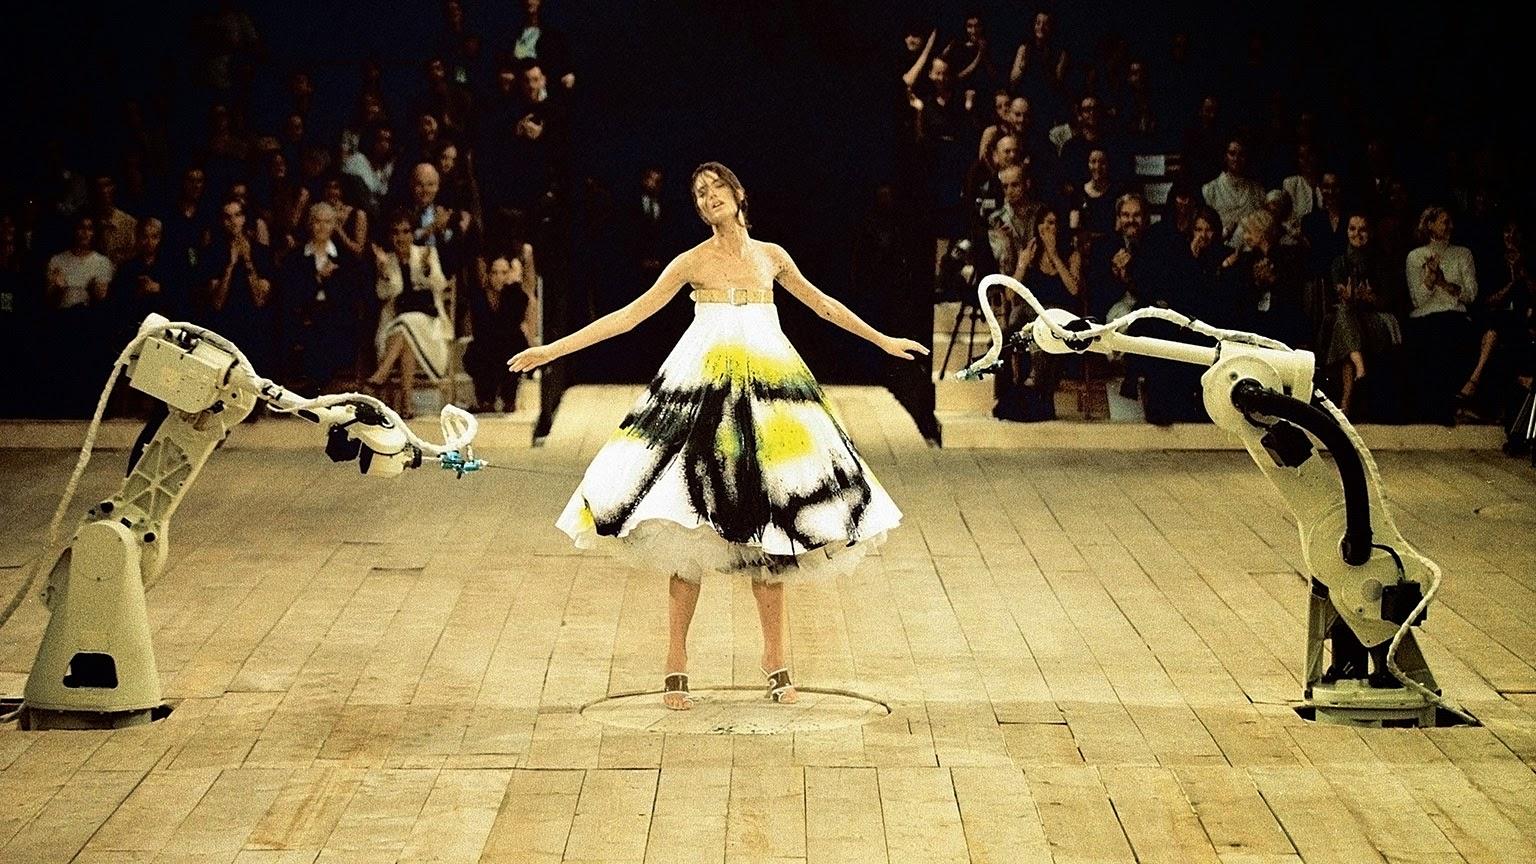 No. 13 dress Alexander McQueen